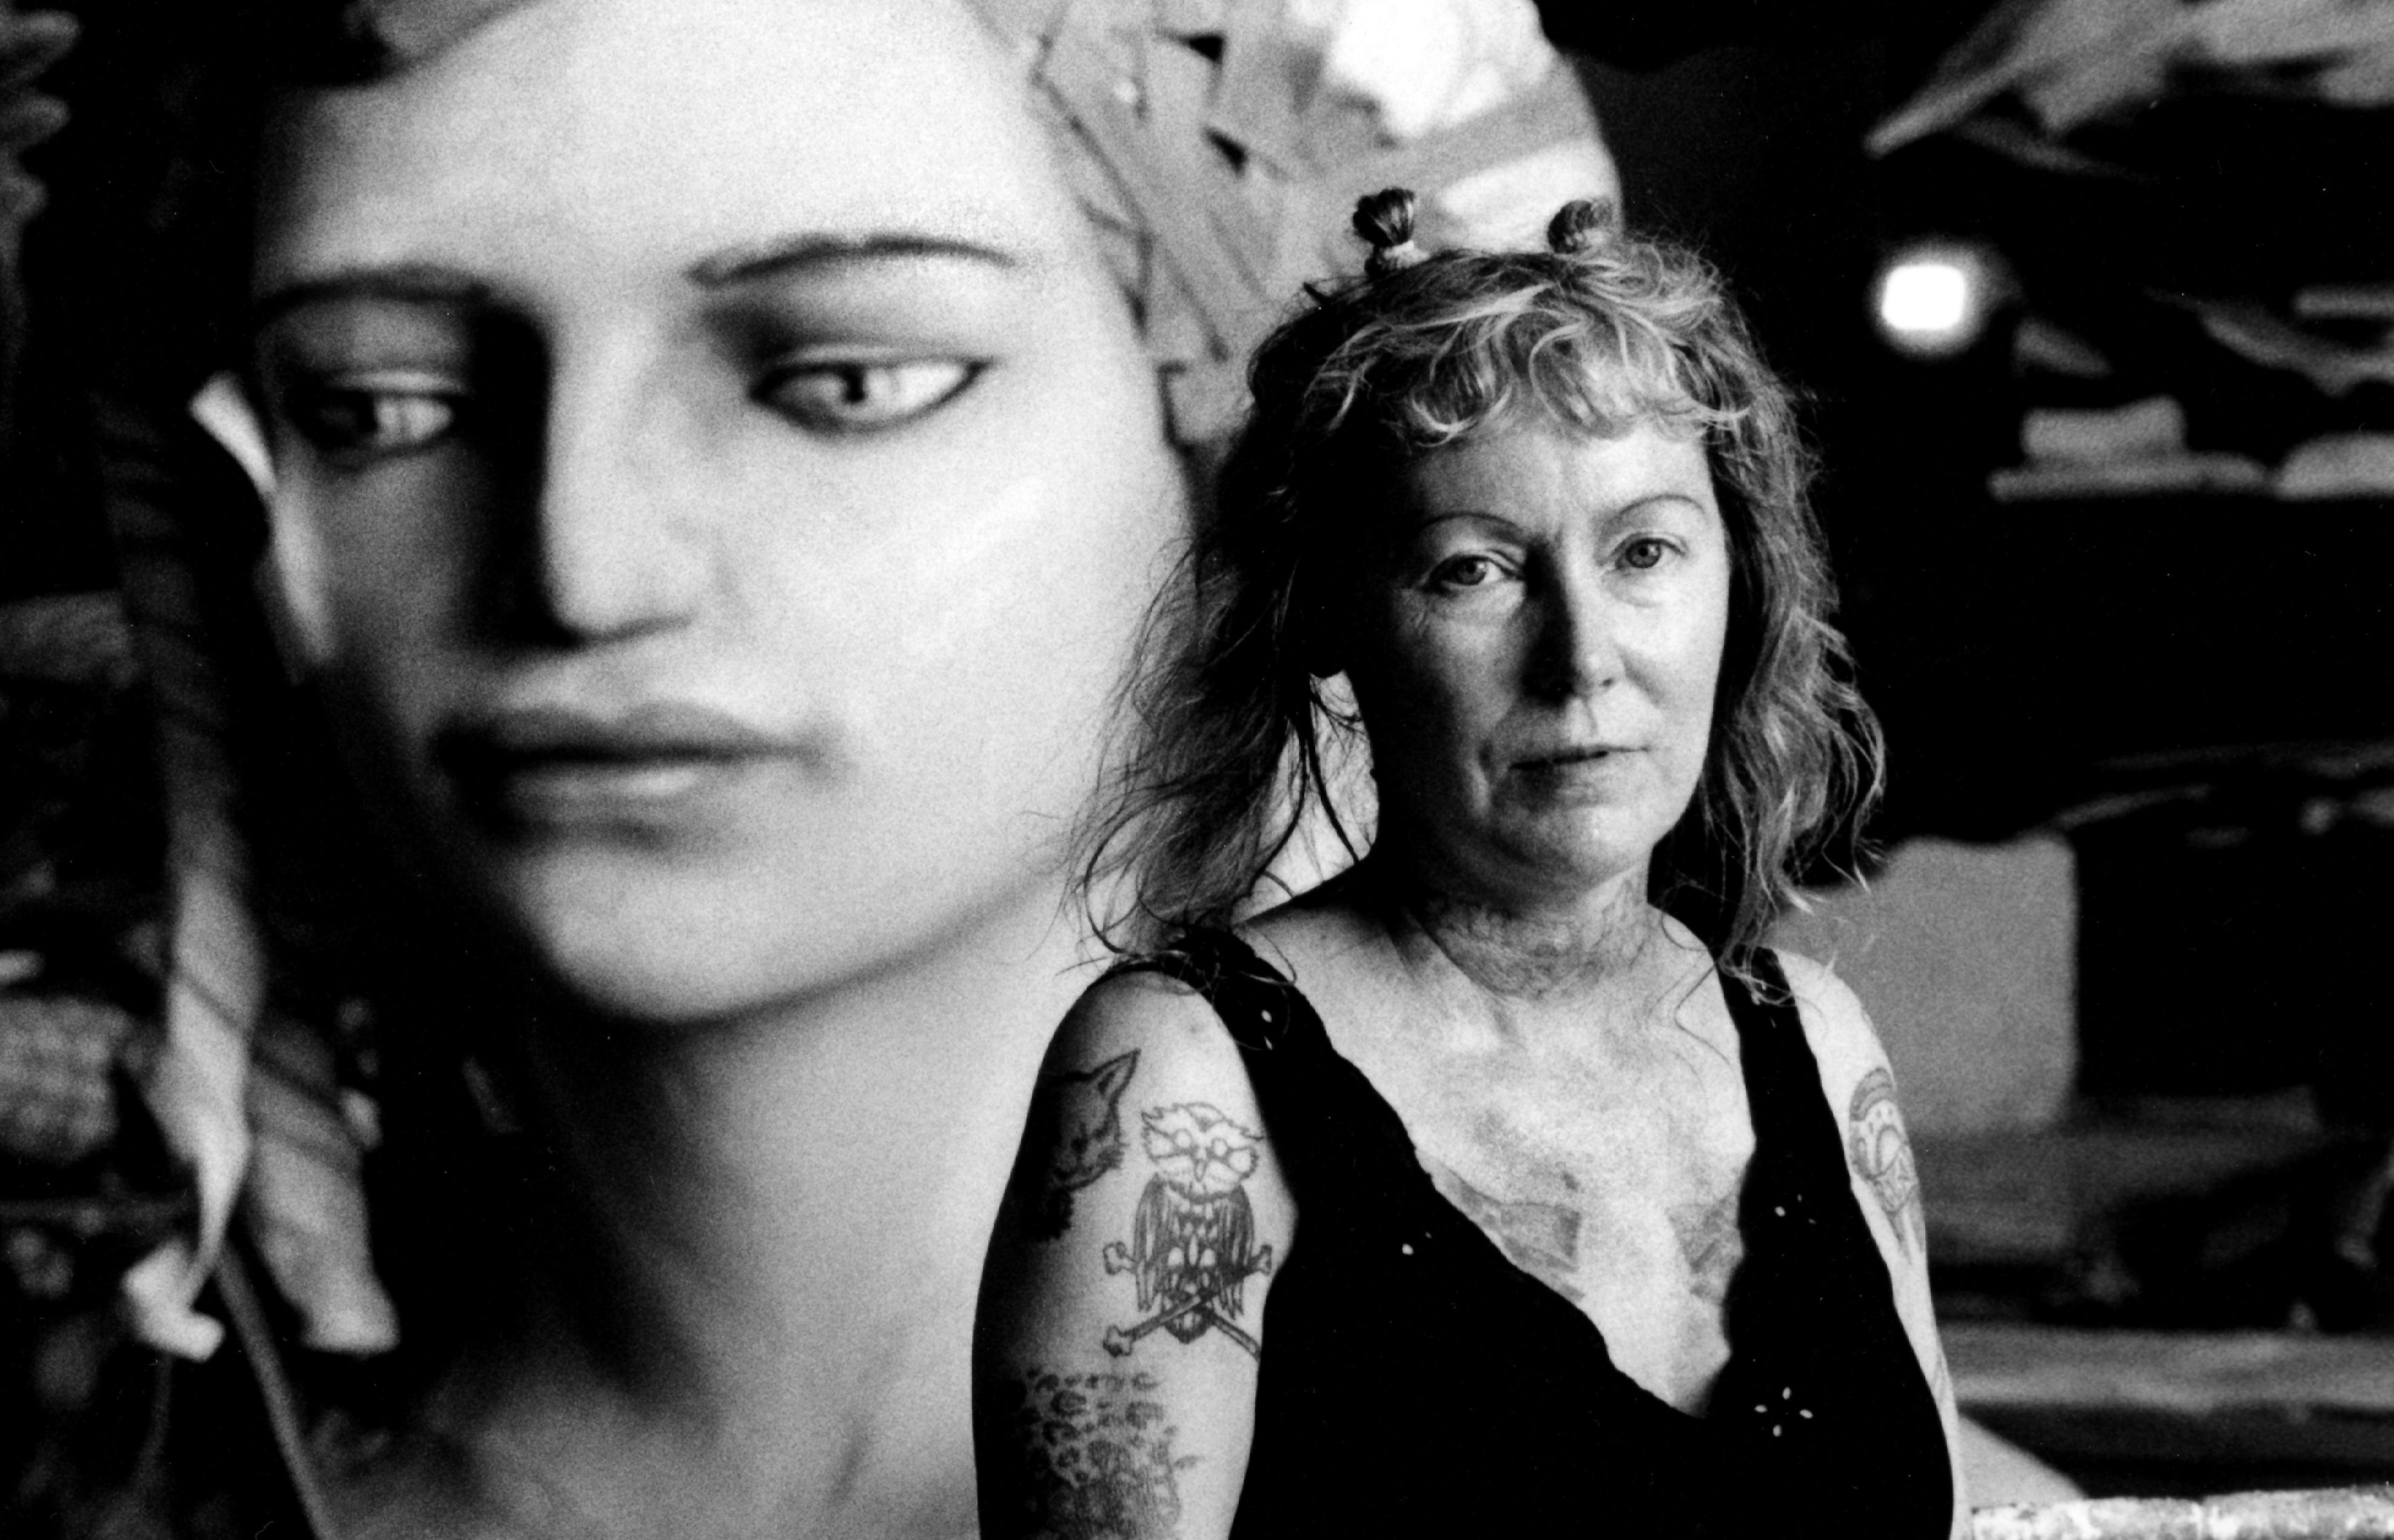 Julia_Baronowski-You-Face-Me_small